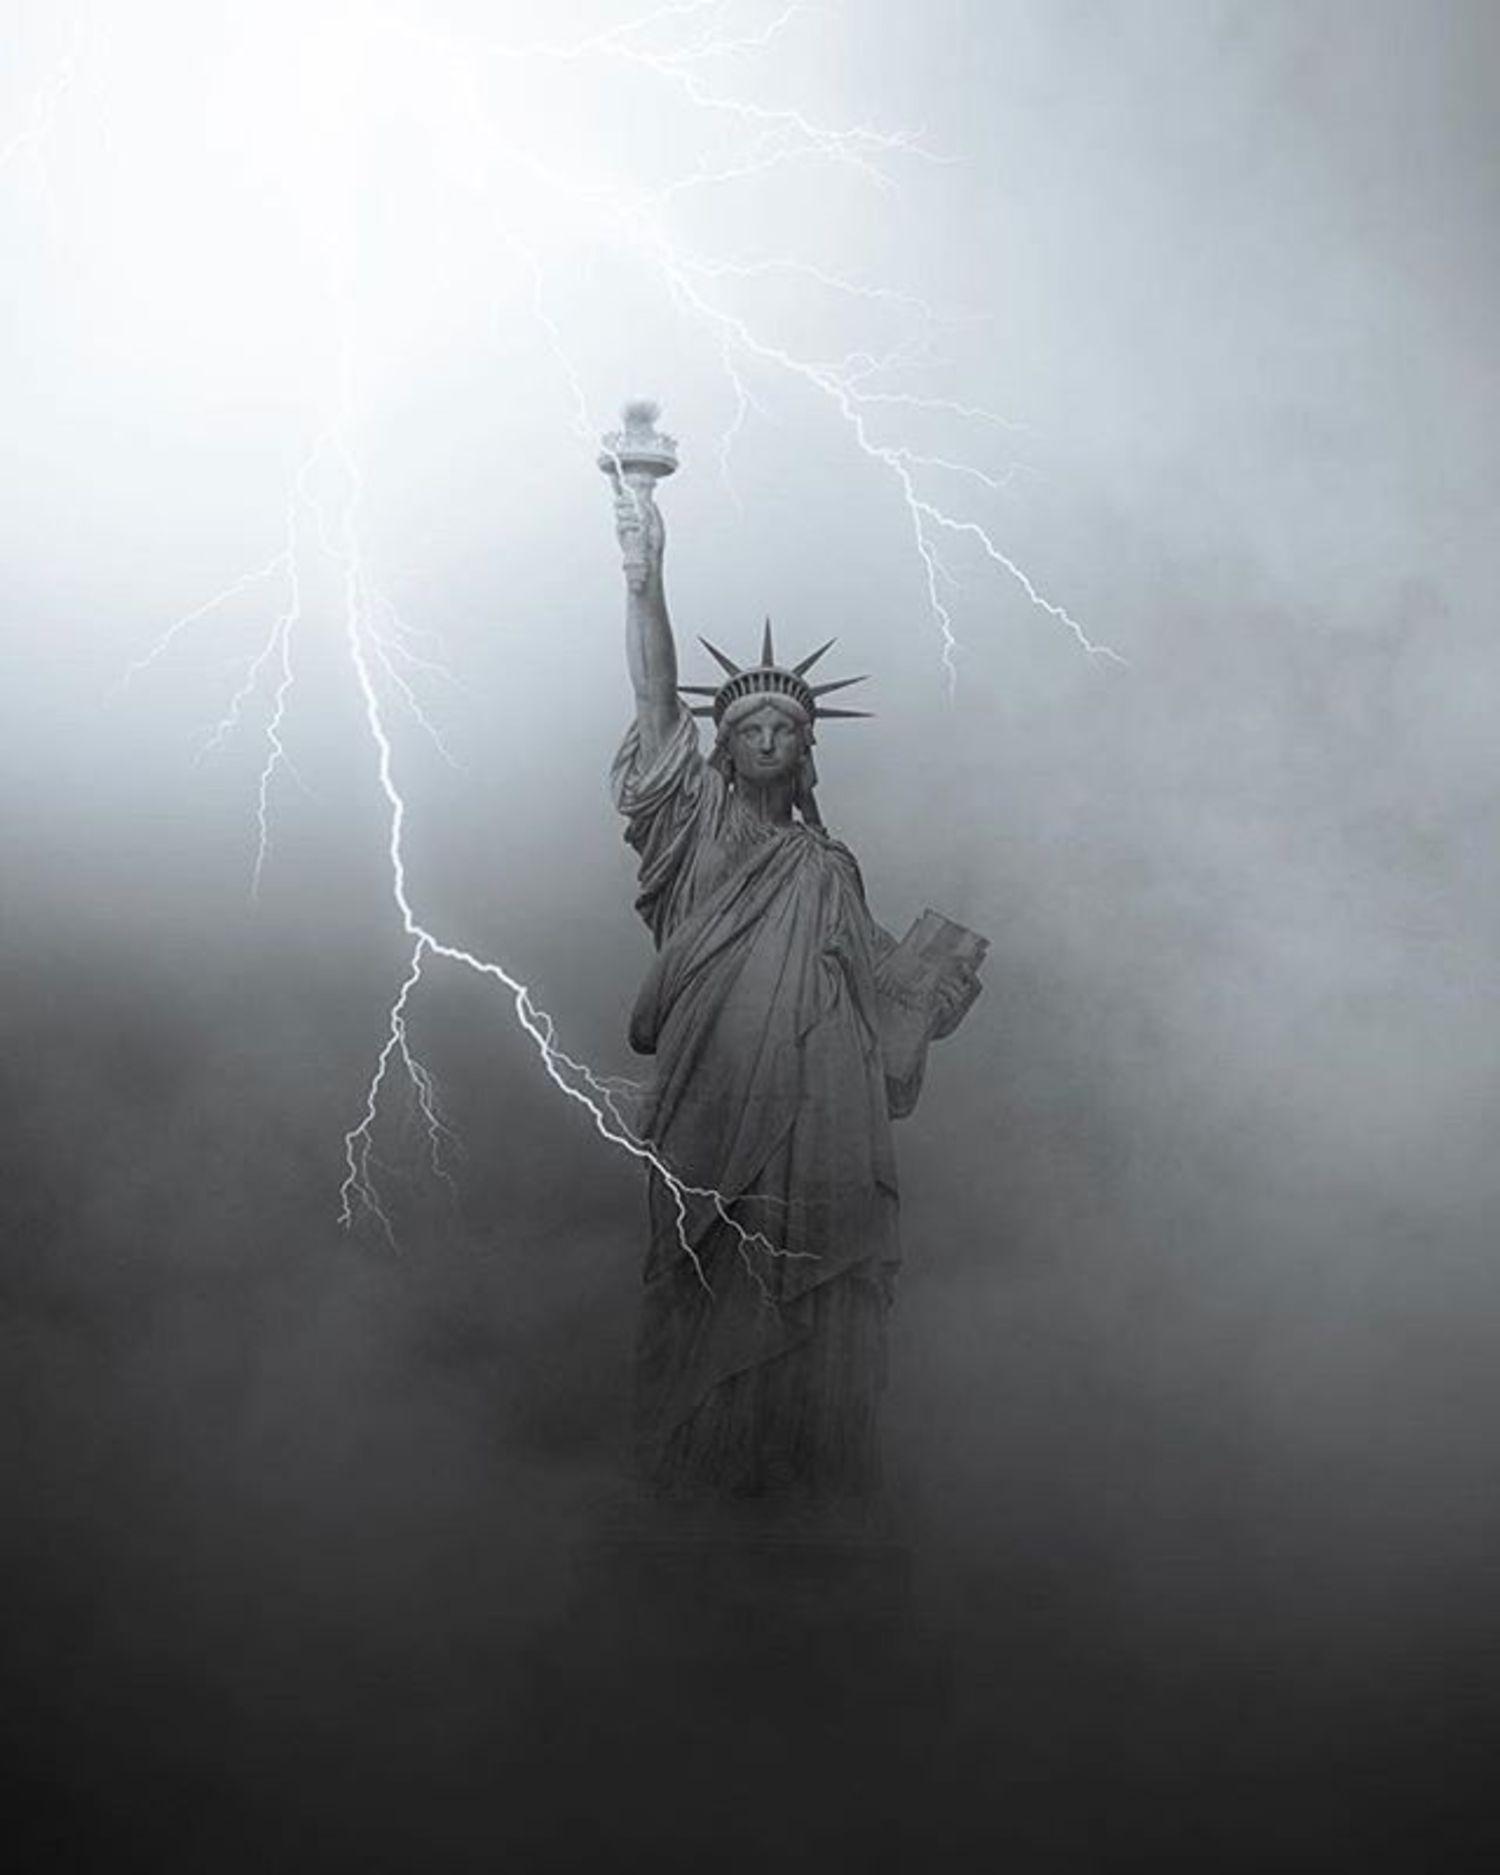 Statue of Liberty, New York. Photo via @raylivez #viewingnyc #newyorkcity #newyork